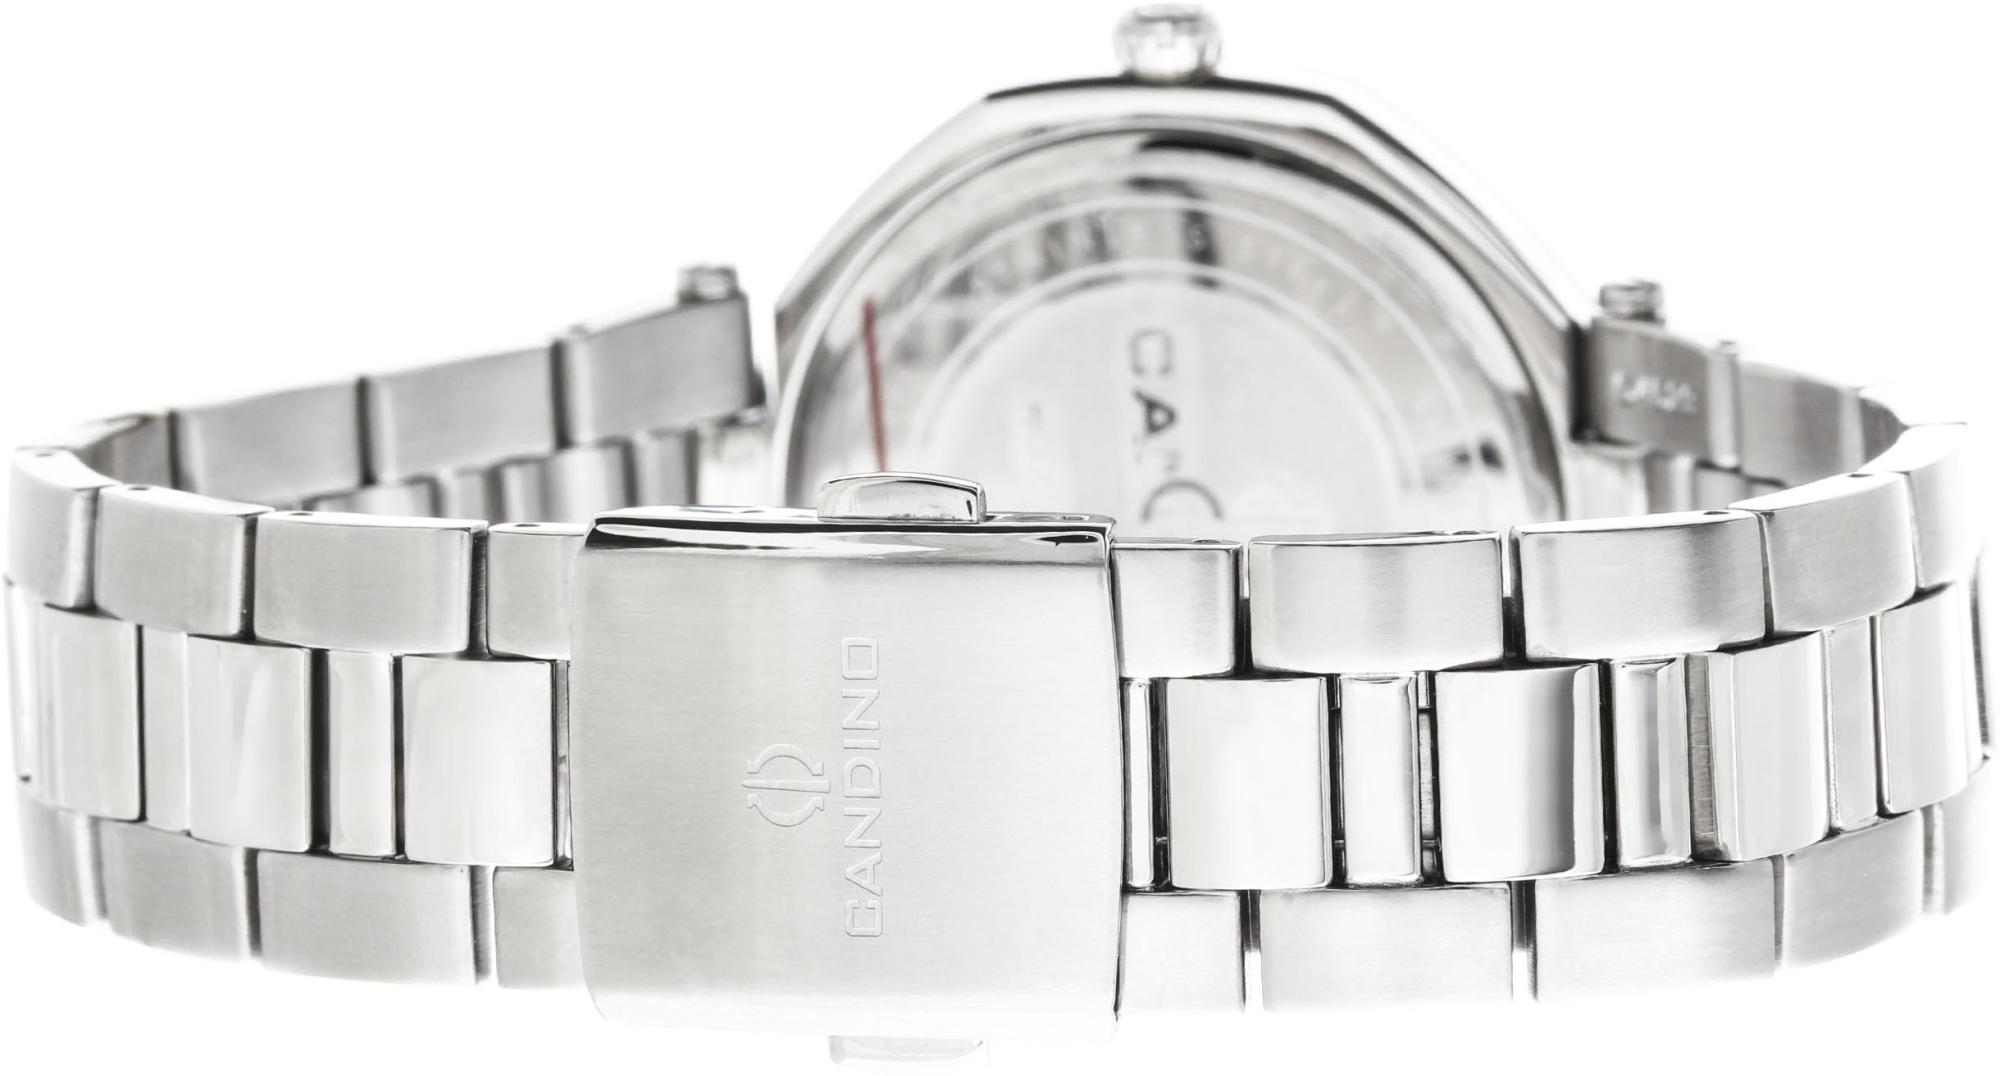 Candino Elegance C4523/4Наручные часы<br>Швейцарские часы Candino Elegance C4523/4<br><br>Пол: Женские<br>Страна-производитель: Швейцария<br>Механизм: Кварцевый<br>Материал корпуса: Сталь<br>Материал ремня/браслета: Сталь<br>Водозащита, диапазон: None<br>Стекло: Сапфировое<br>Толщина корпуса: None<br>Стиль: None